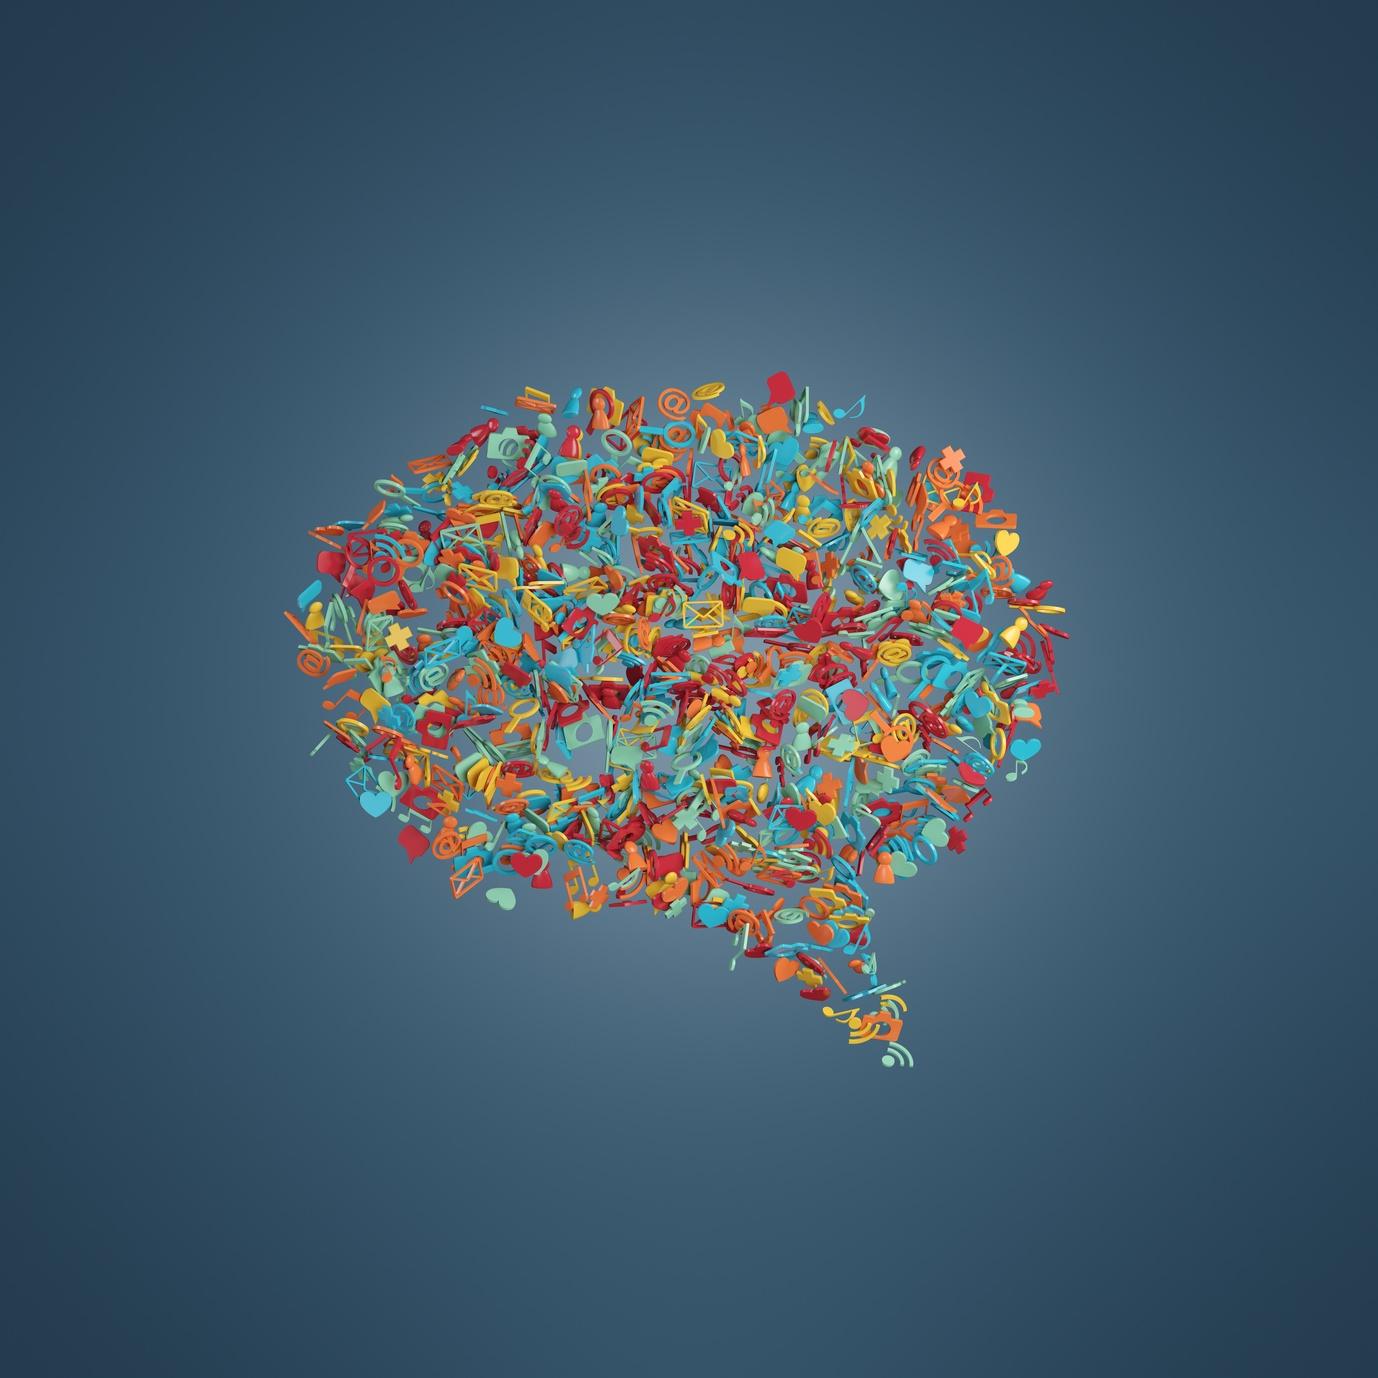 BlogPost 6610327639 How Social Media is impacting the Hiring Process